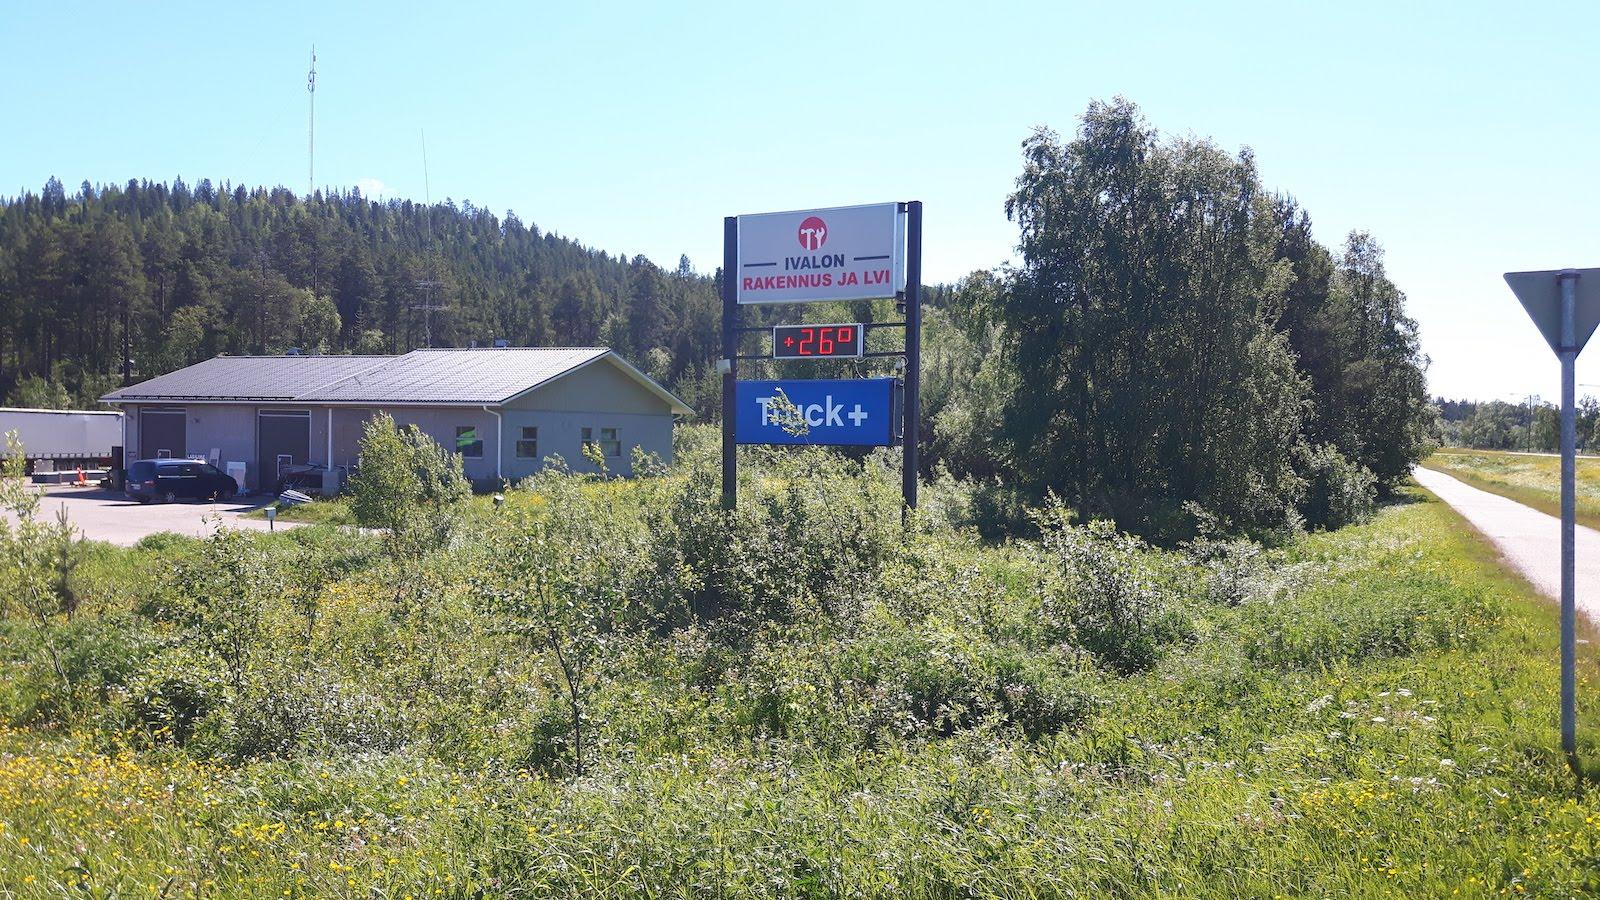 Warm weather near Ivalo Finland